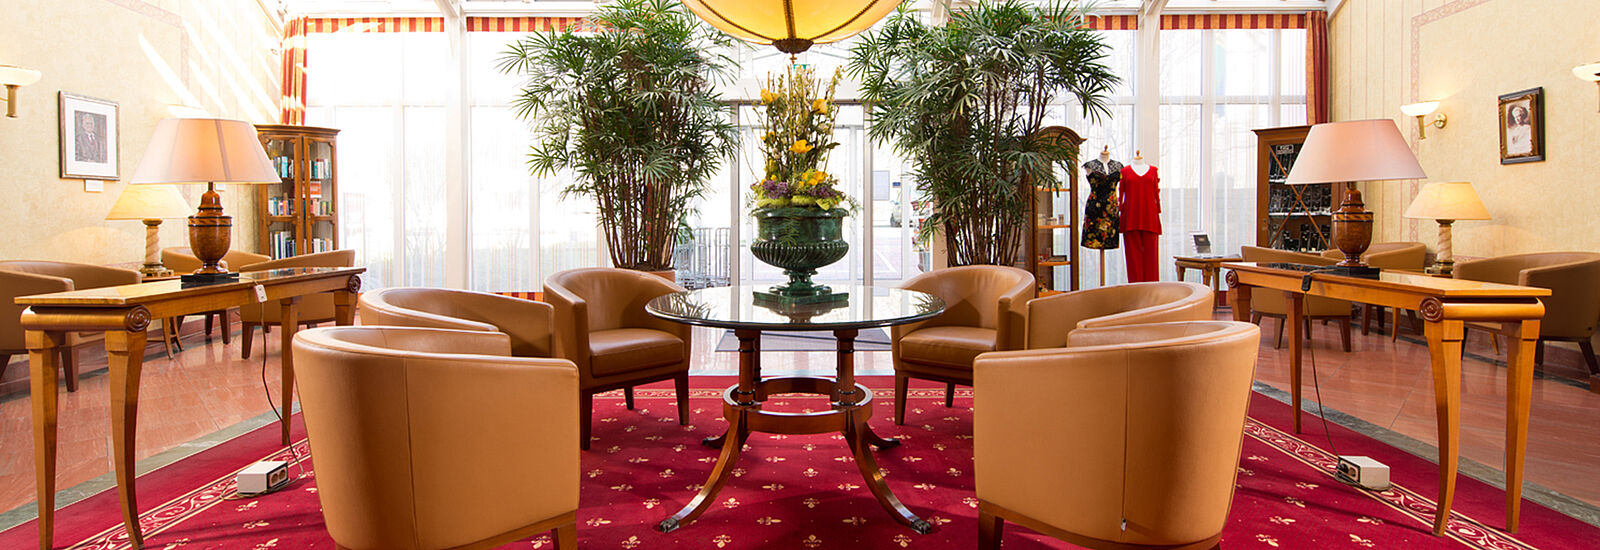 Lobby_Hotel am Schlosspark